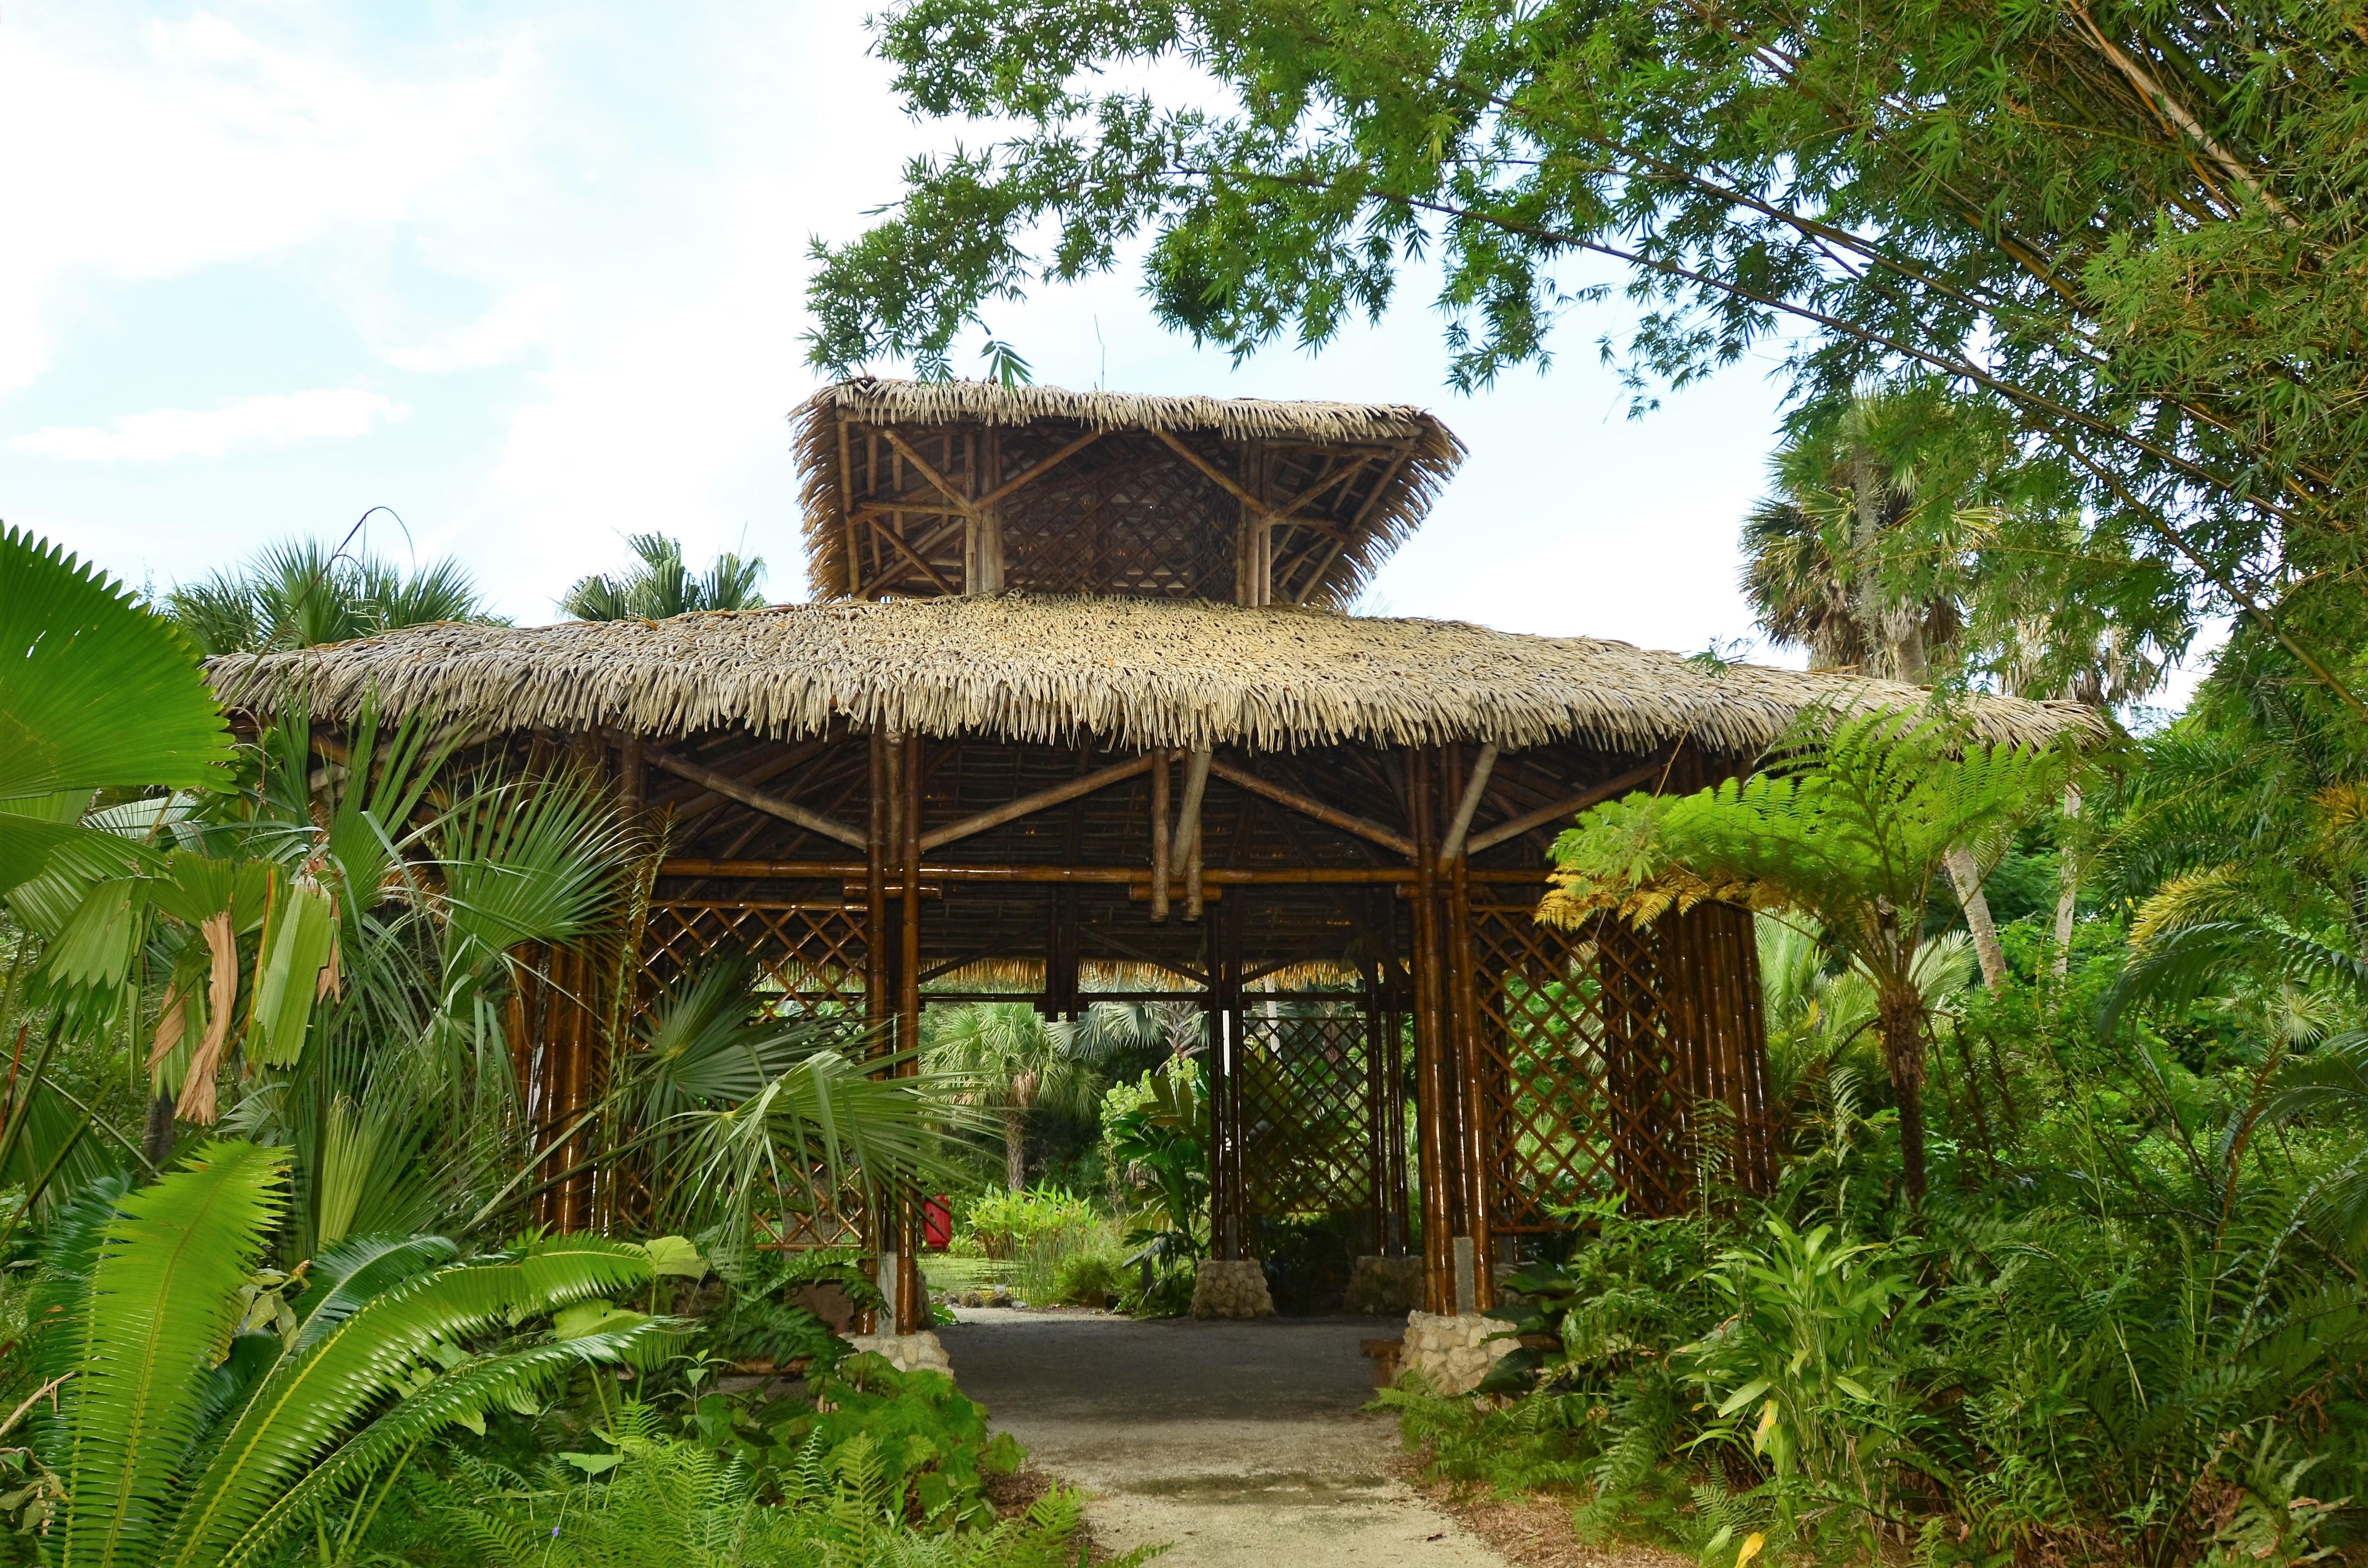 File:McKee Botanical Gardens Bamboo Pavilion 0990